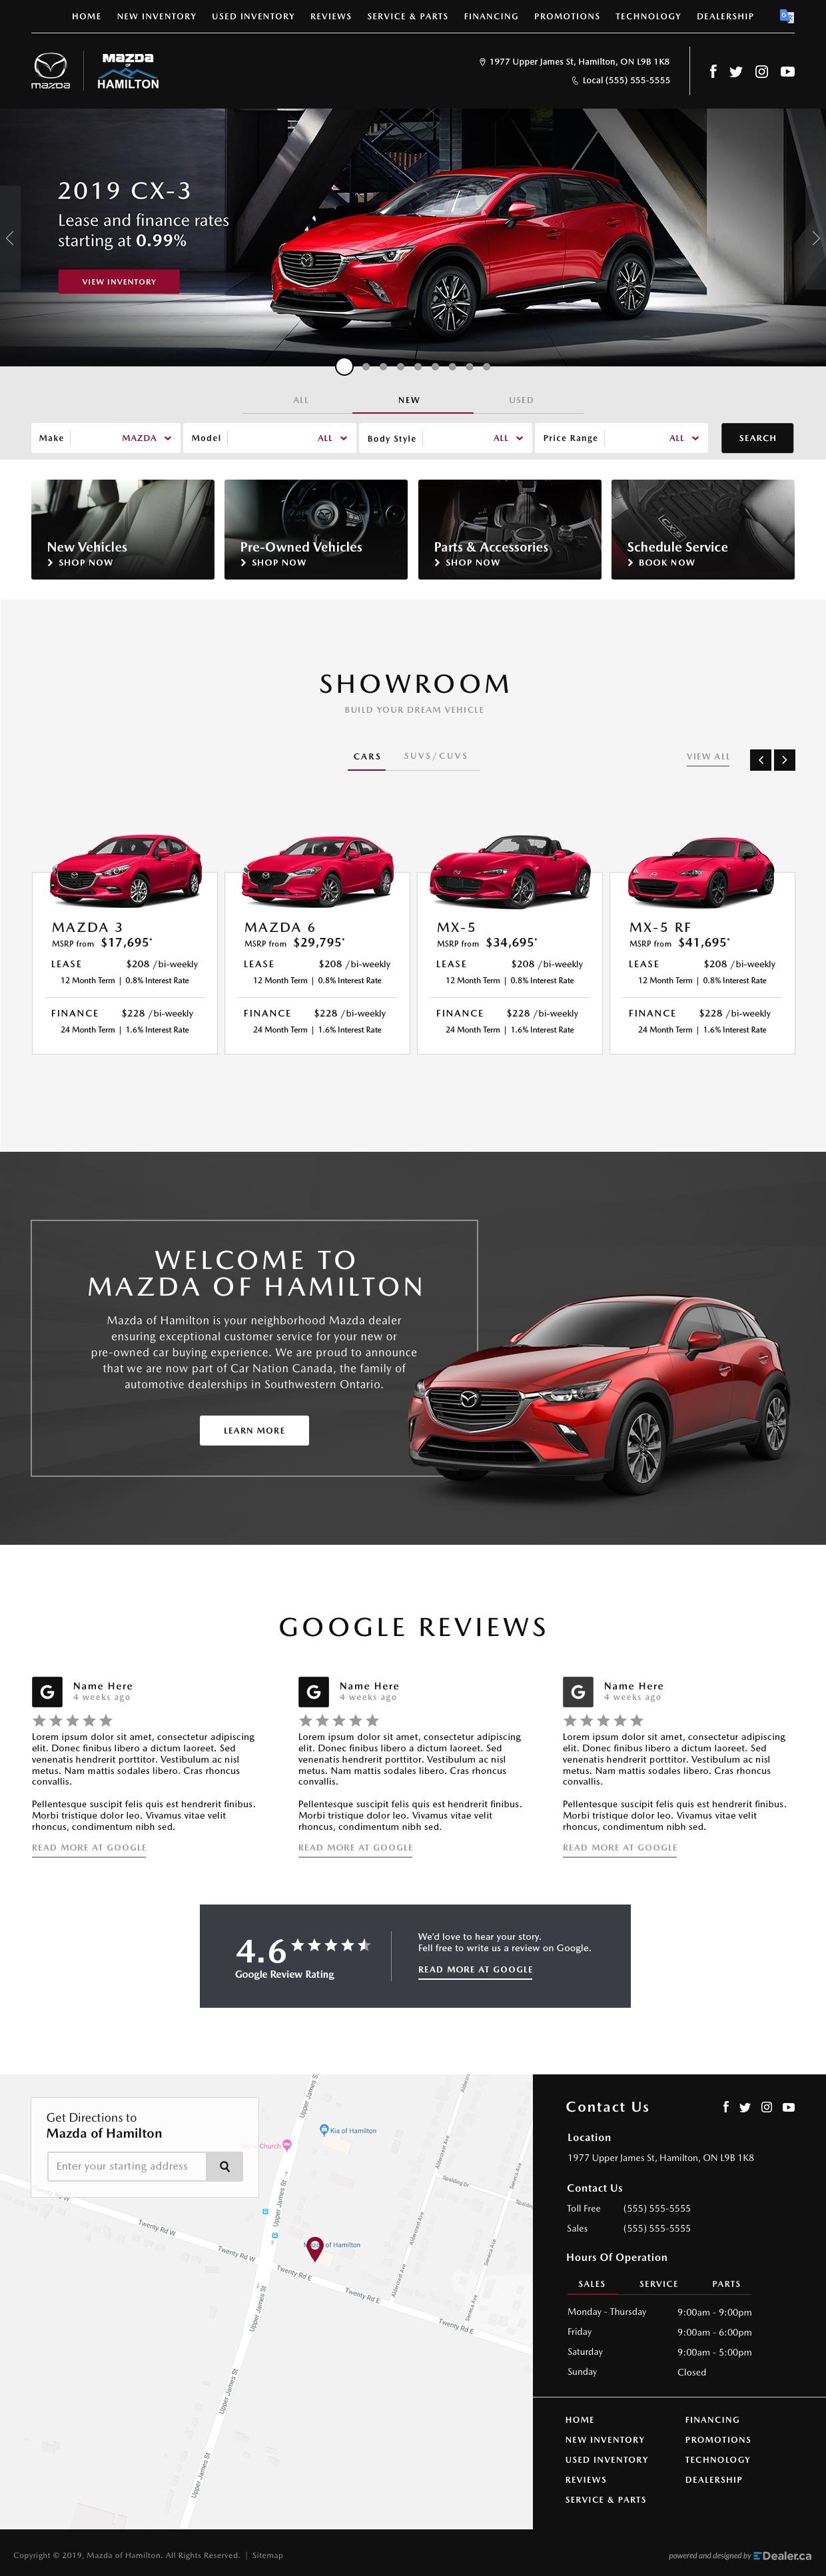 Mazda of Hamilton